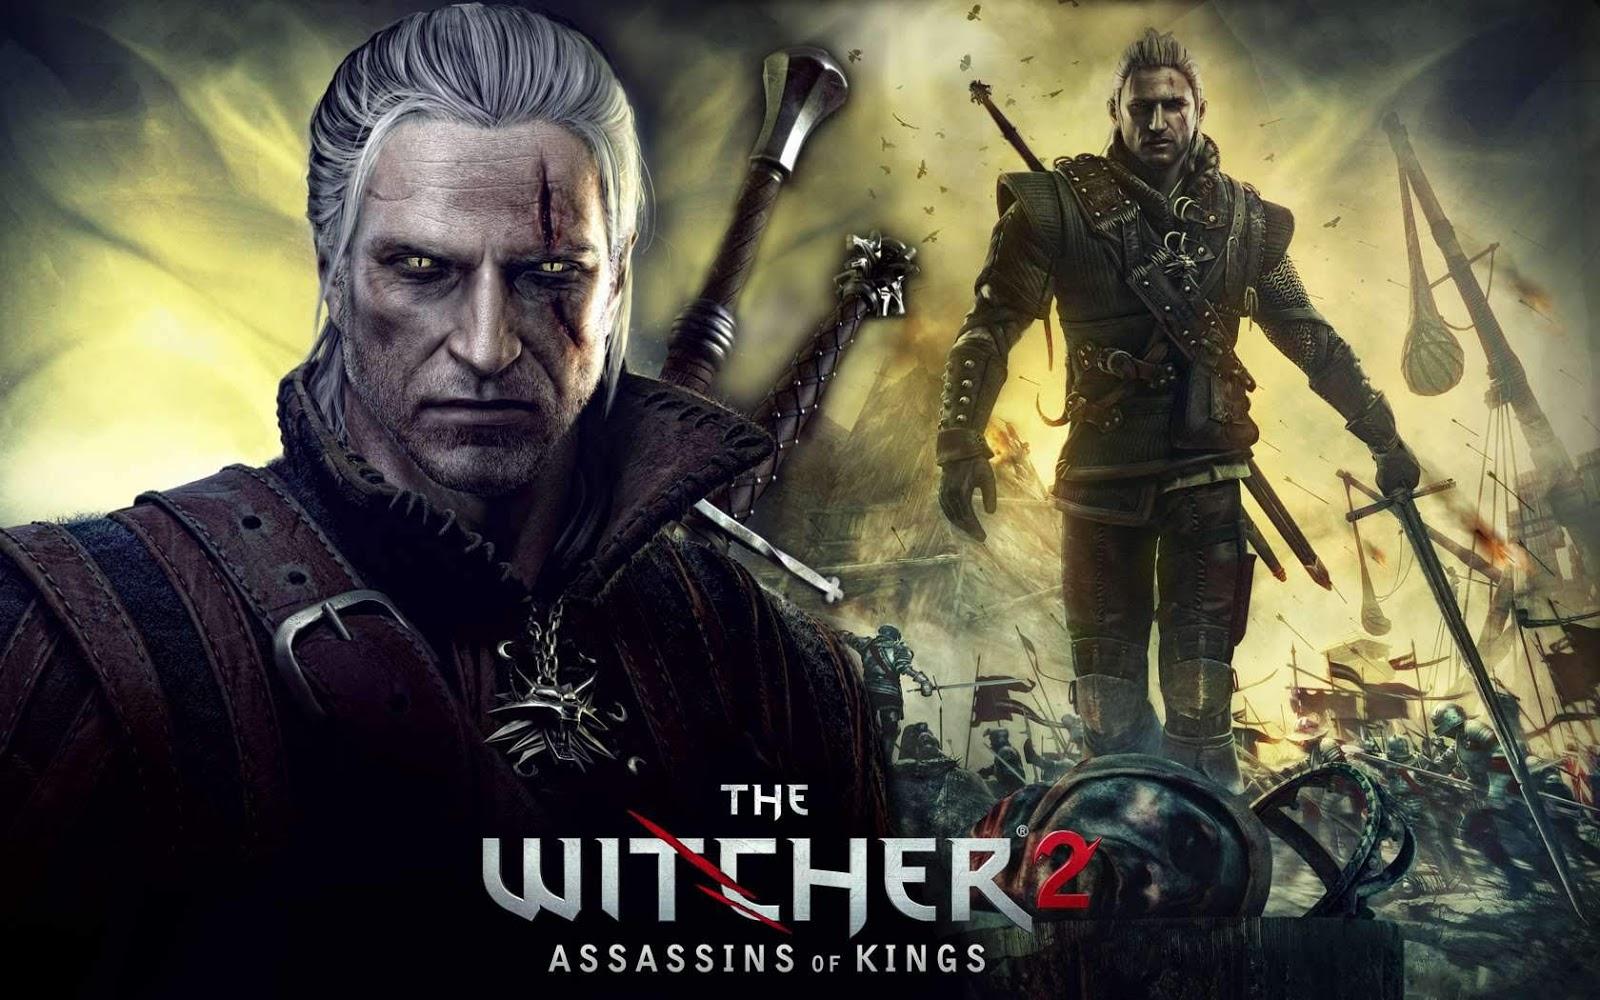 the-witcher-2-assassins-of-kings-viet-hoa